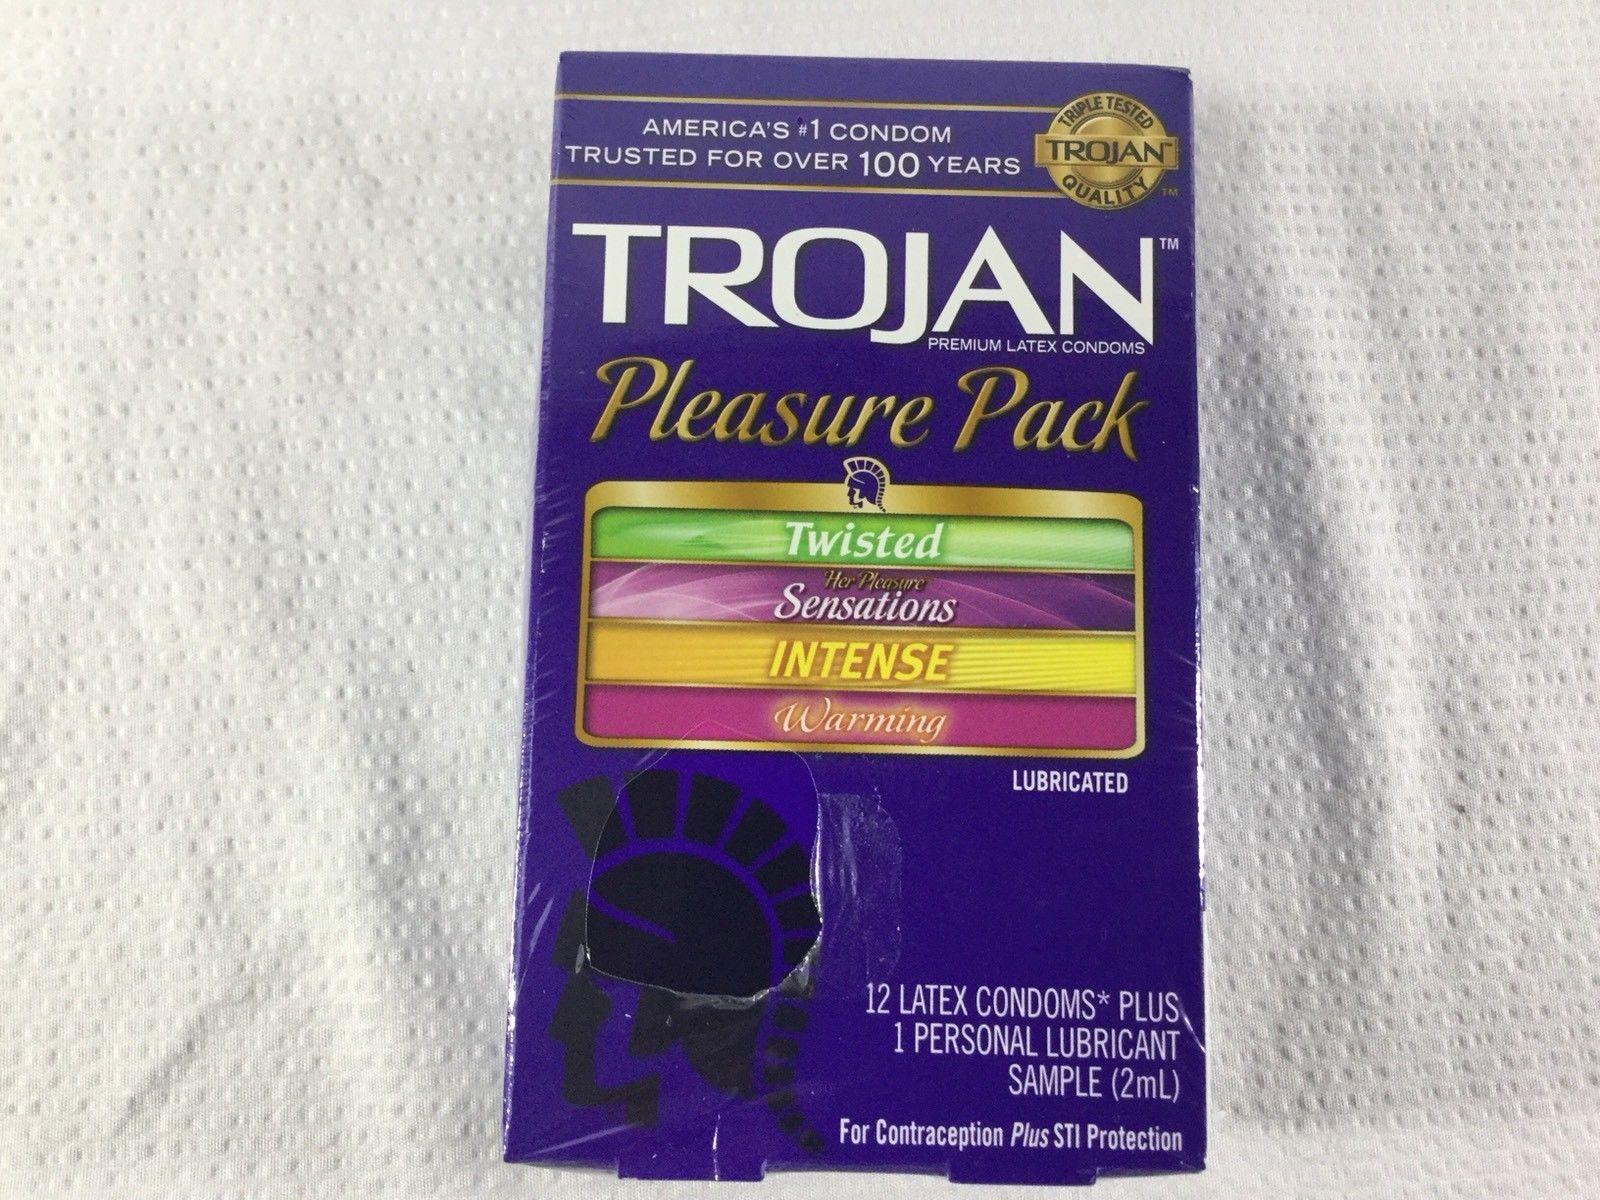 Free: 2 trojan ecstasy sample pack condoms other listia. Com.